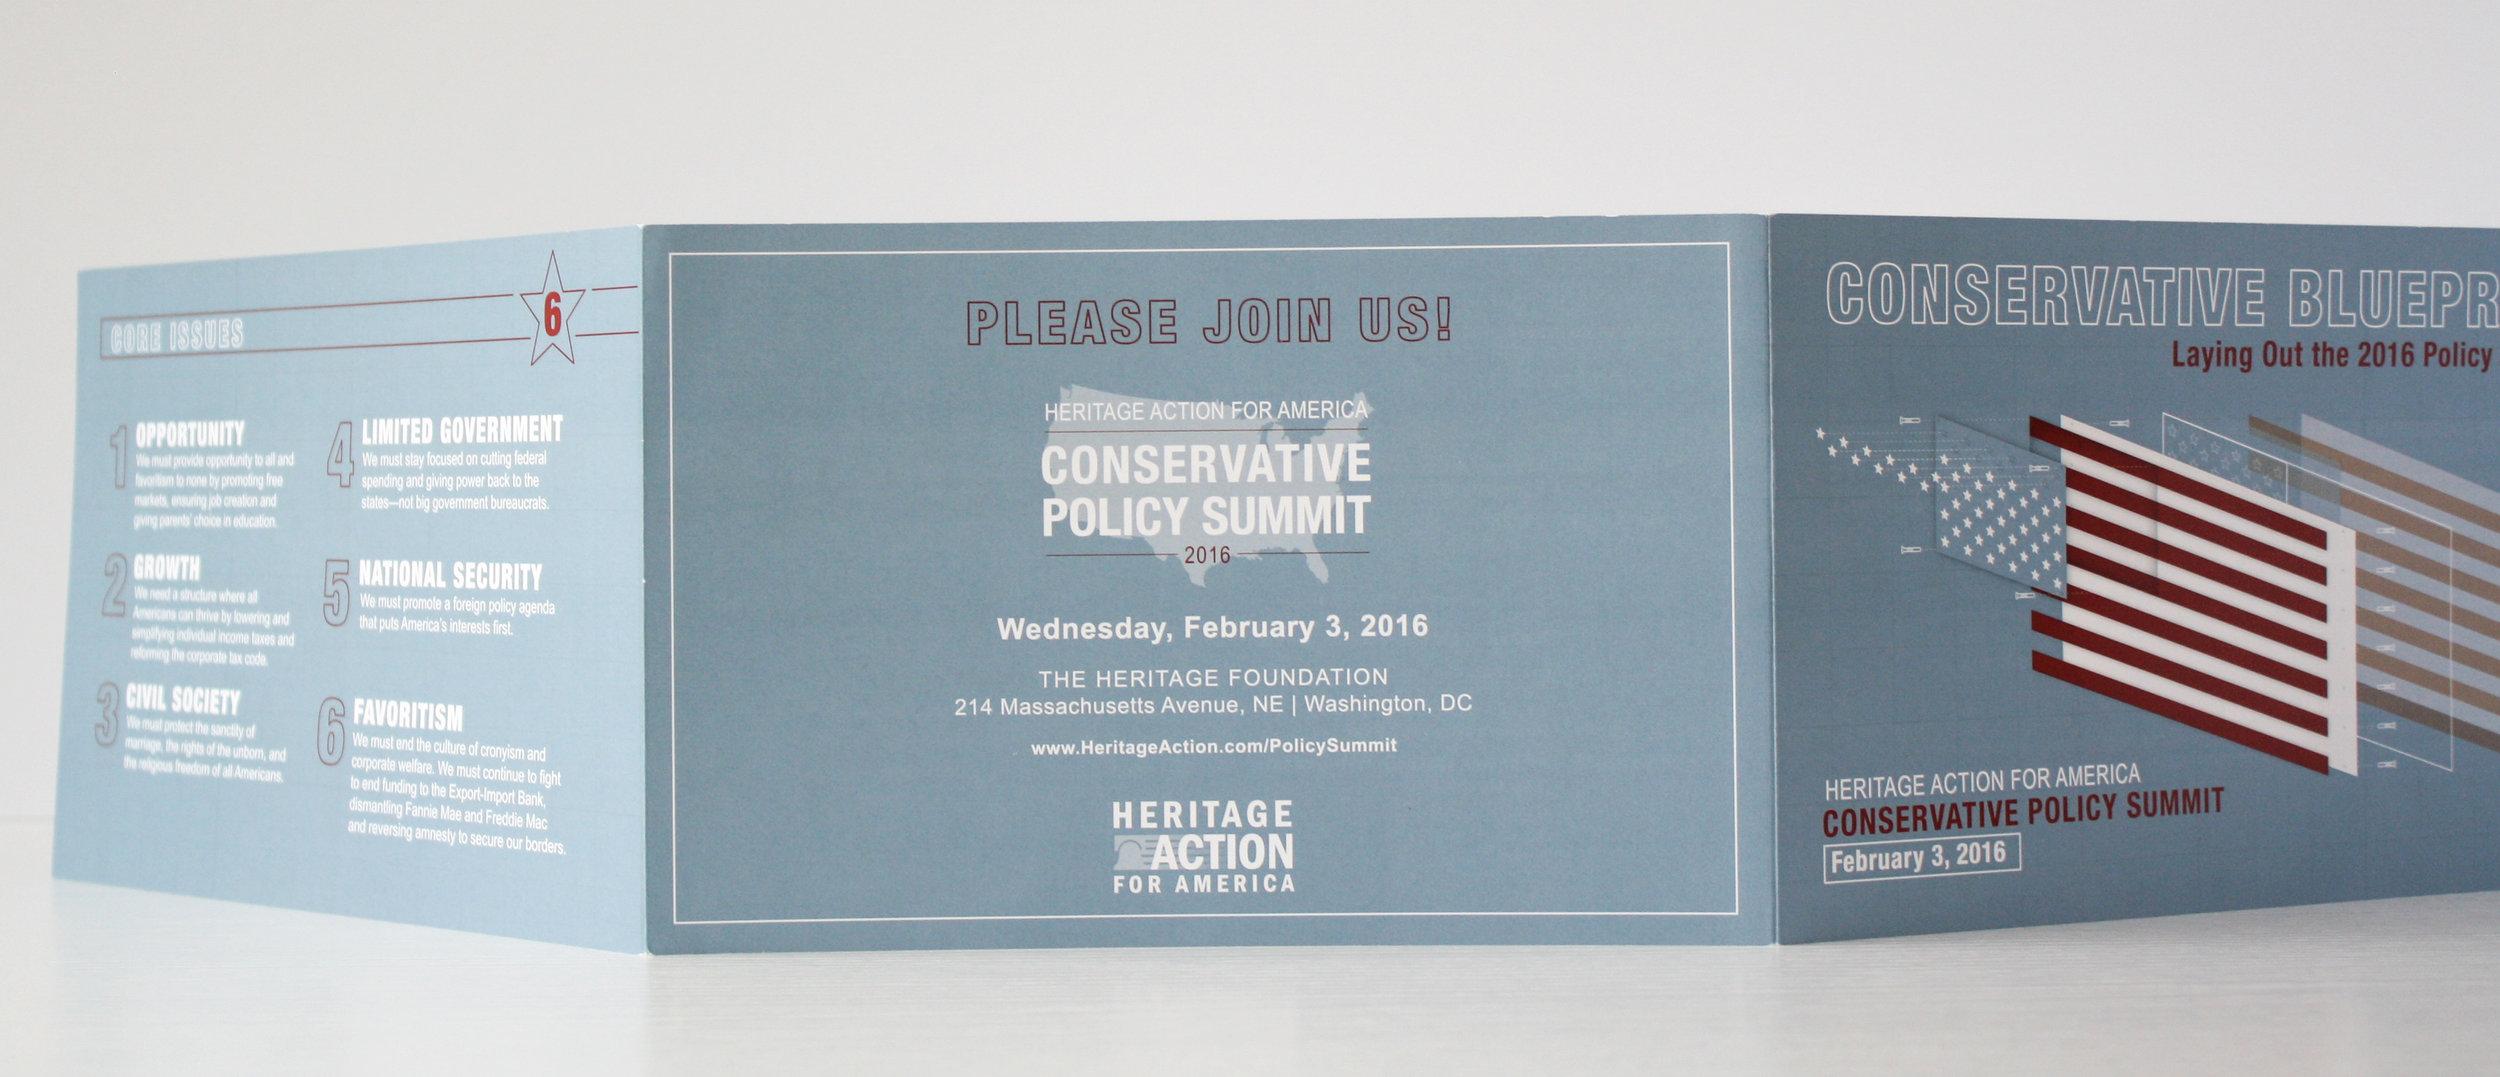 Conservative Policy Summit Corporate Event Invitation | Casi Long Design | casilong.com:portfolio | #casilongdesign #fearlesspursuit 6.jpg